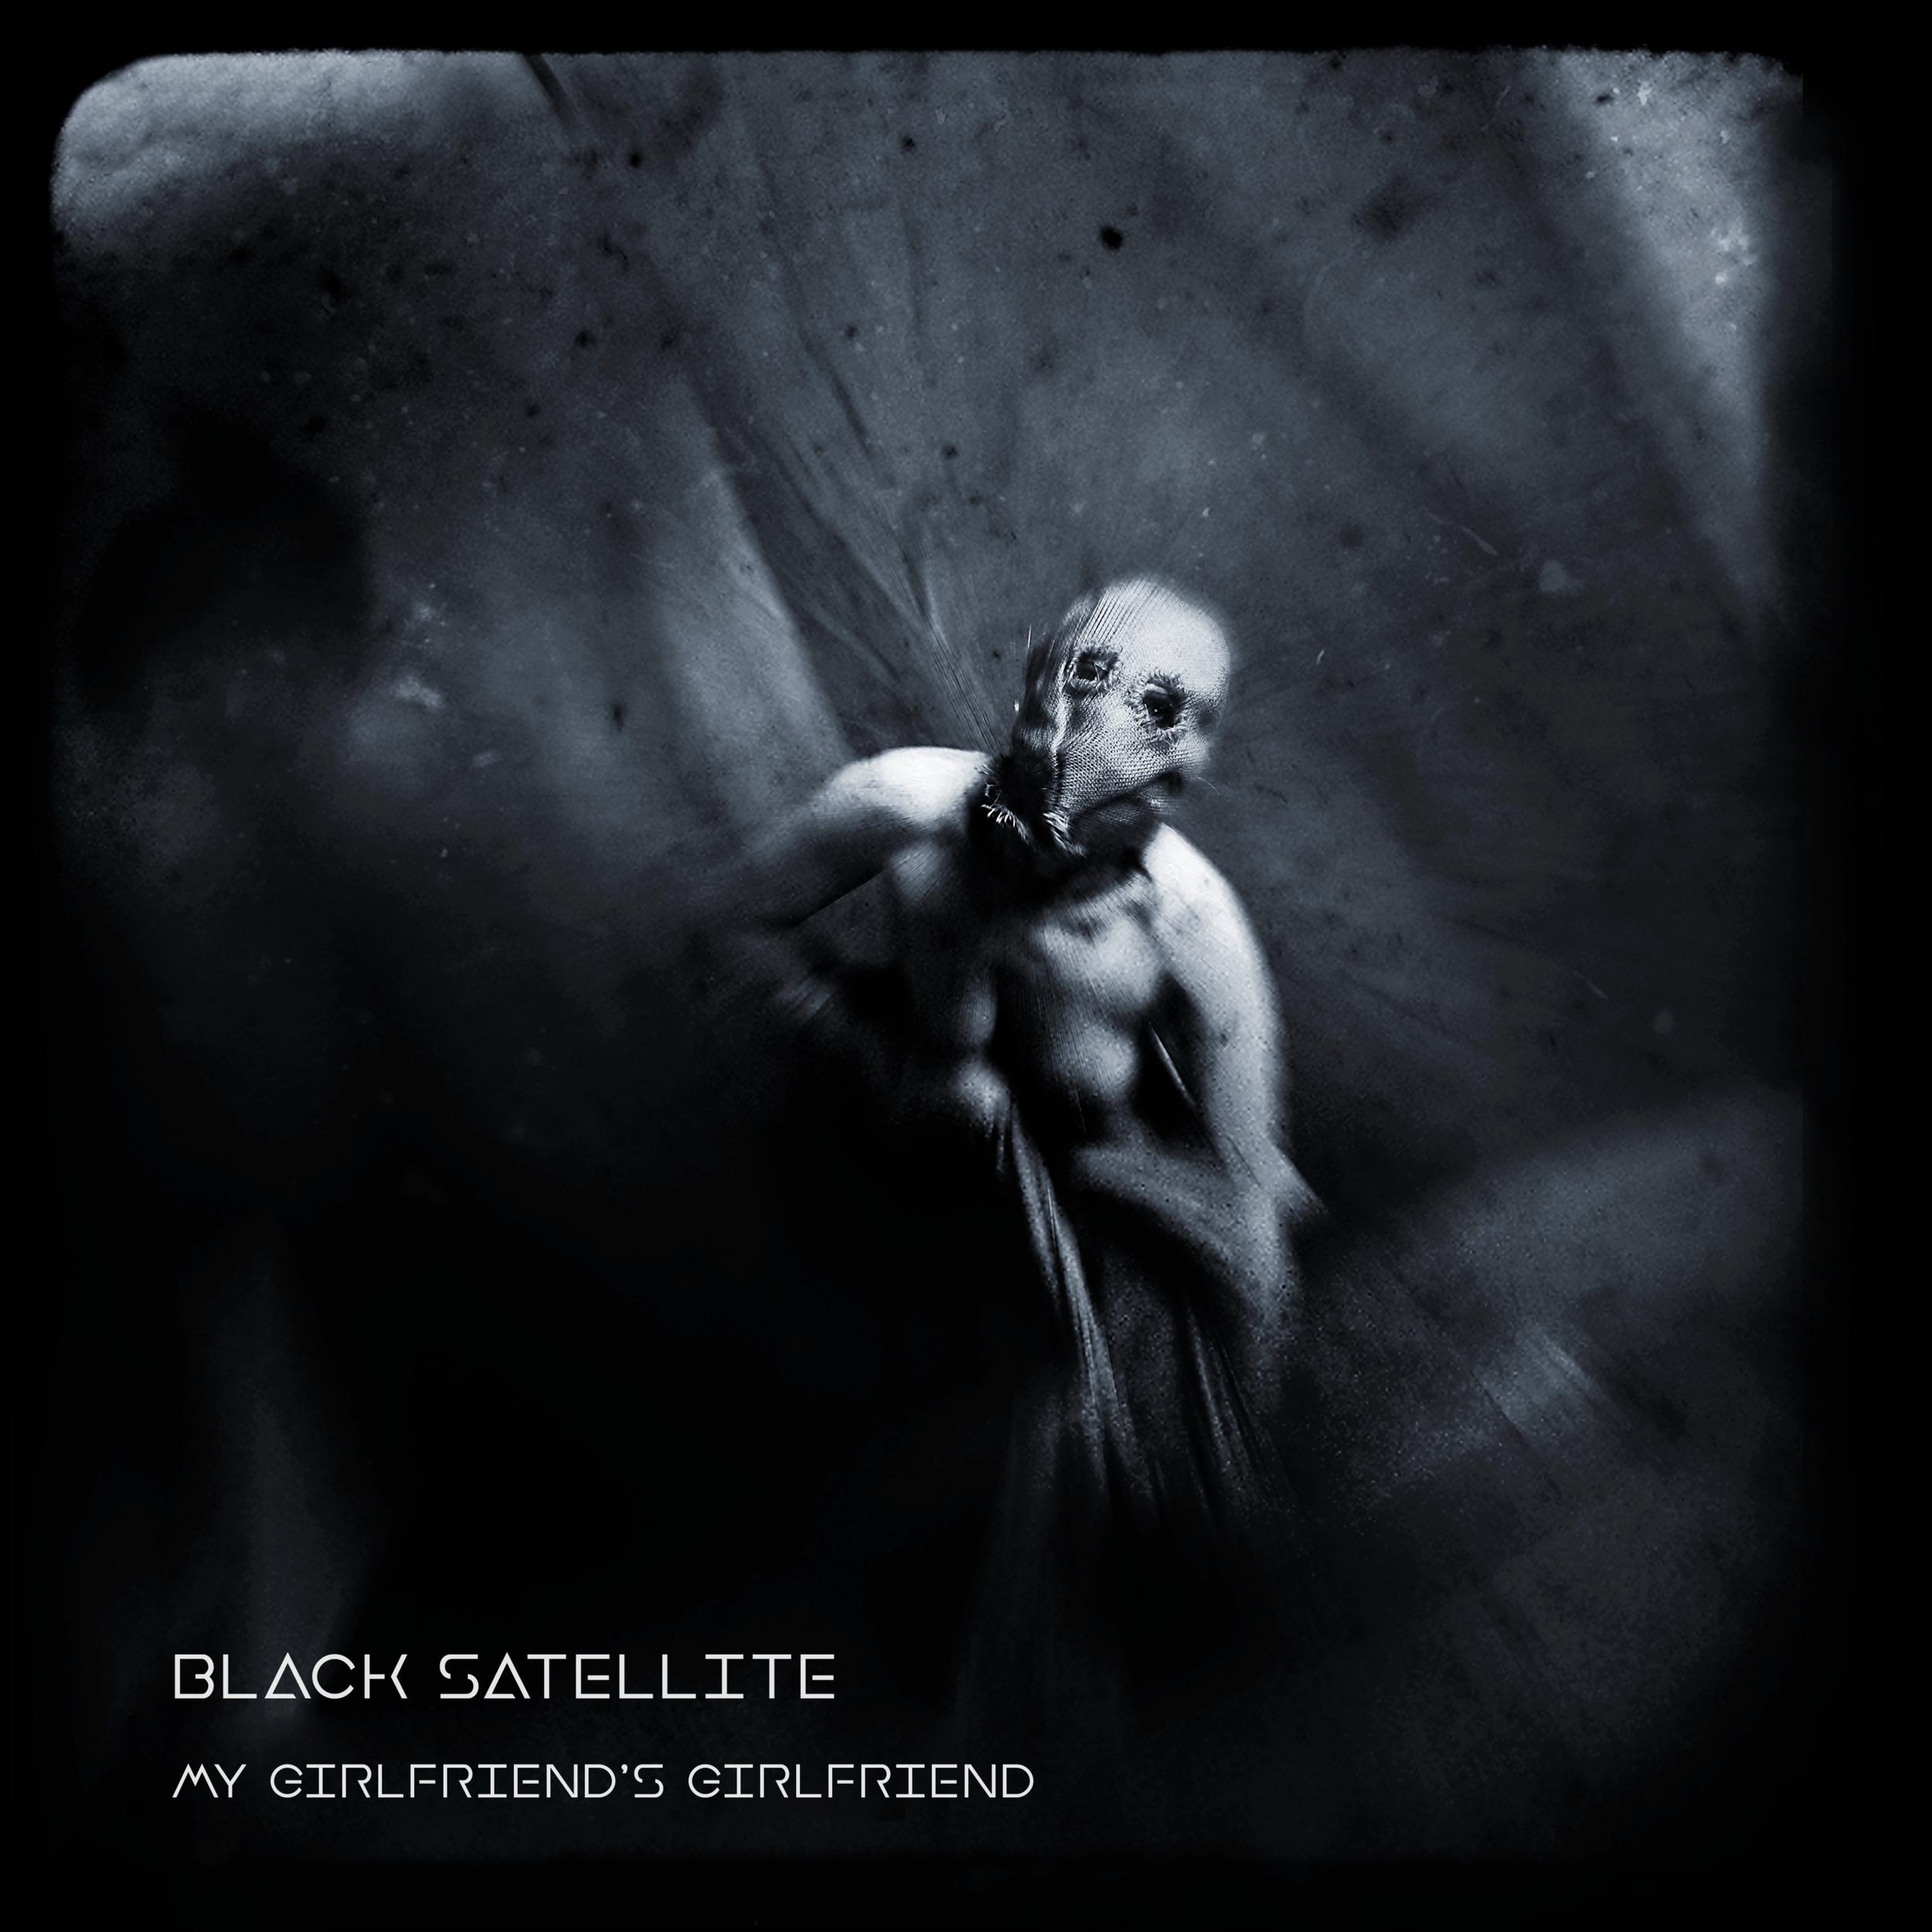 Black Satellite - My Girlfriend's Girlfriend